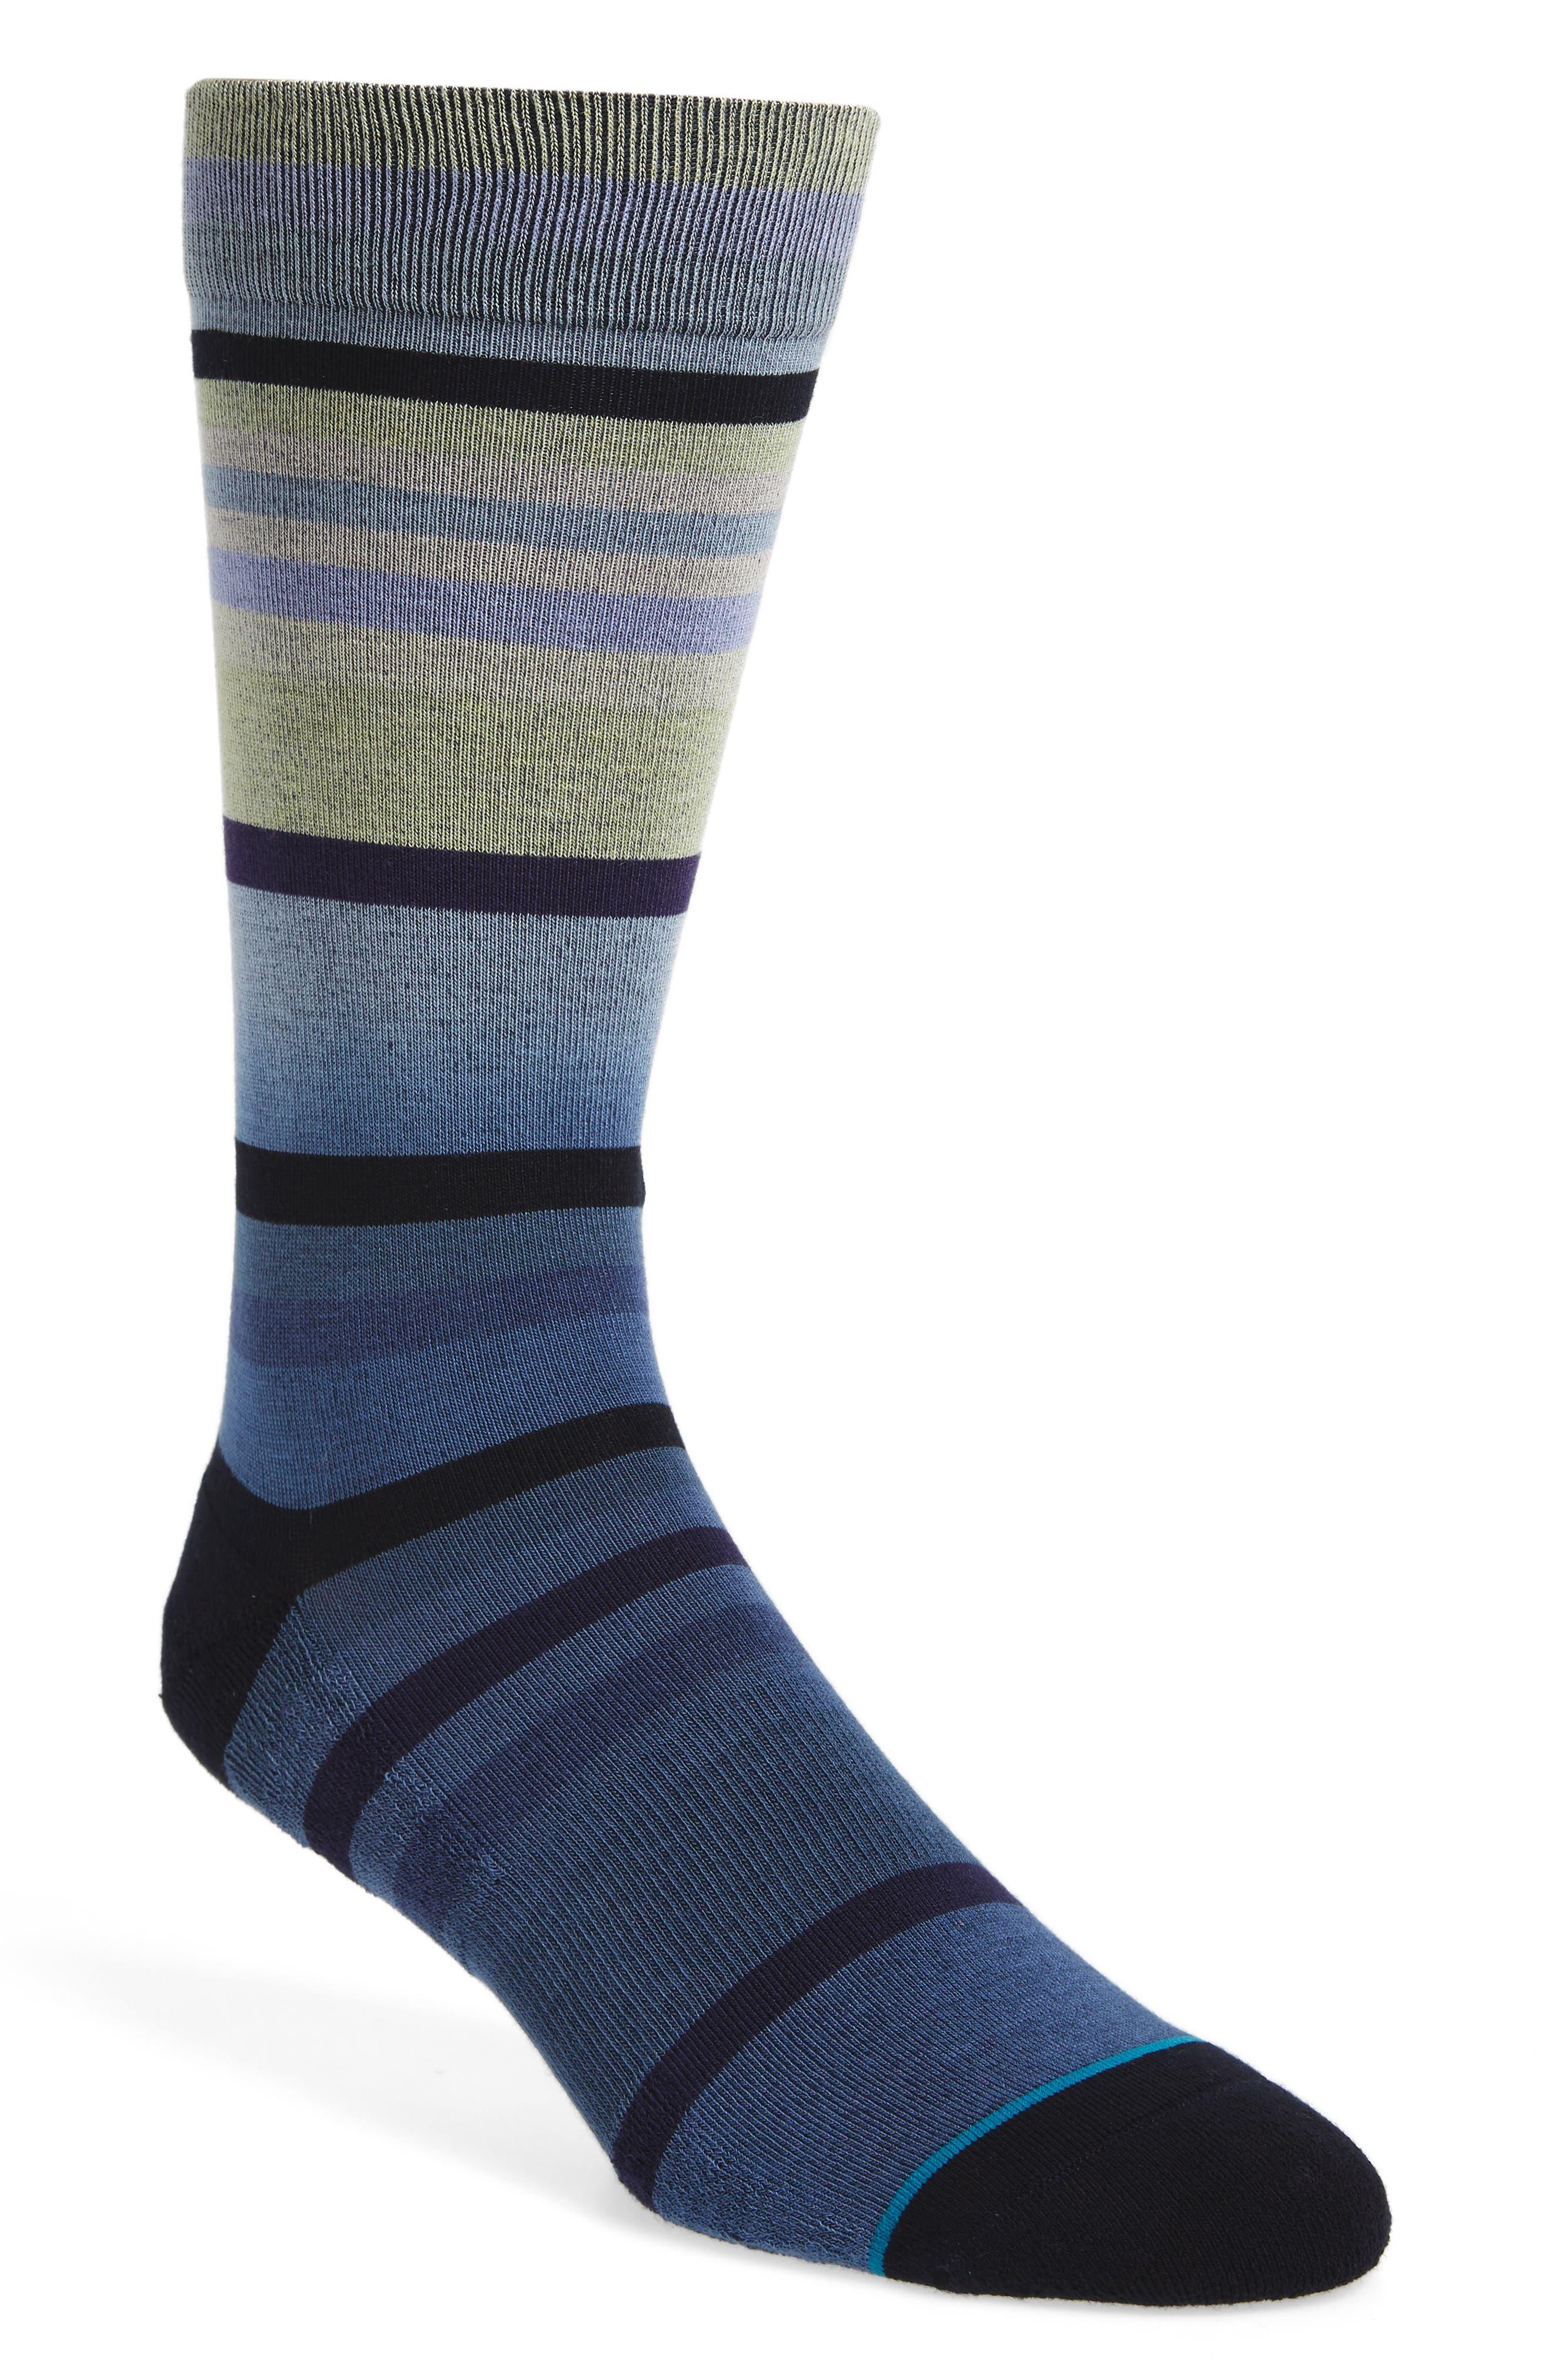 Reserve Worth Socks,                         Main,                         color, Purple/ Black